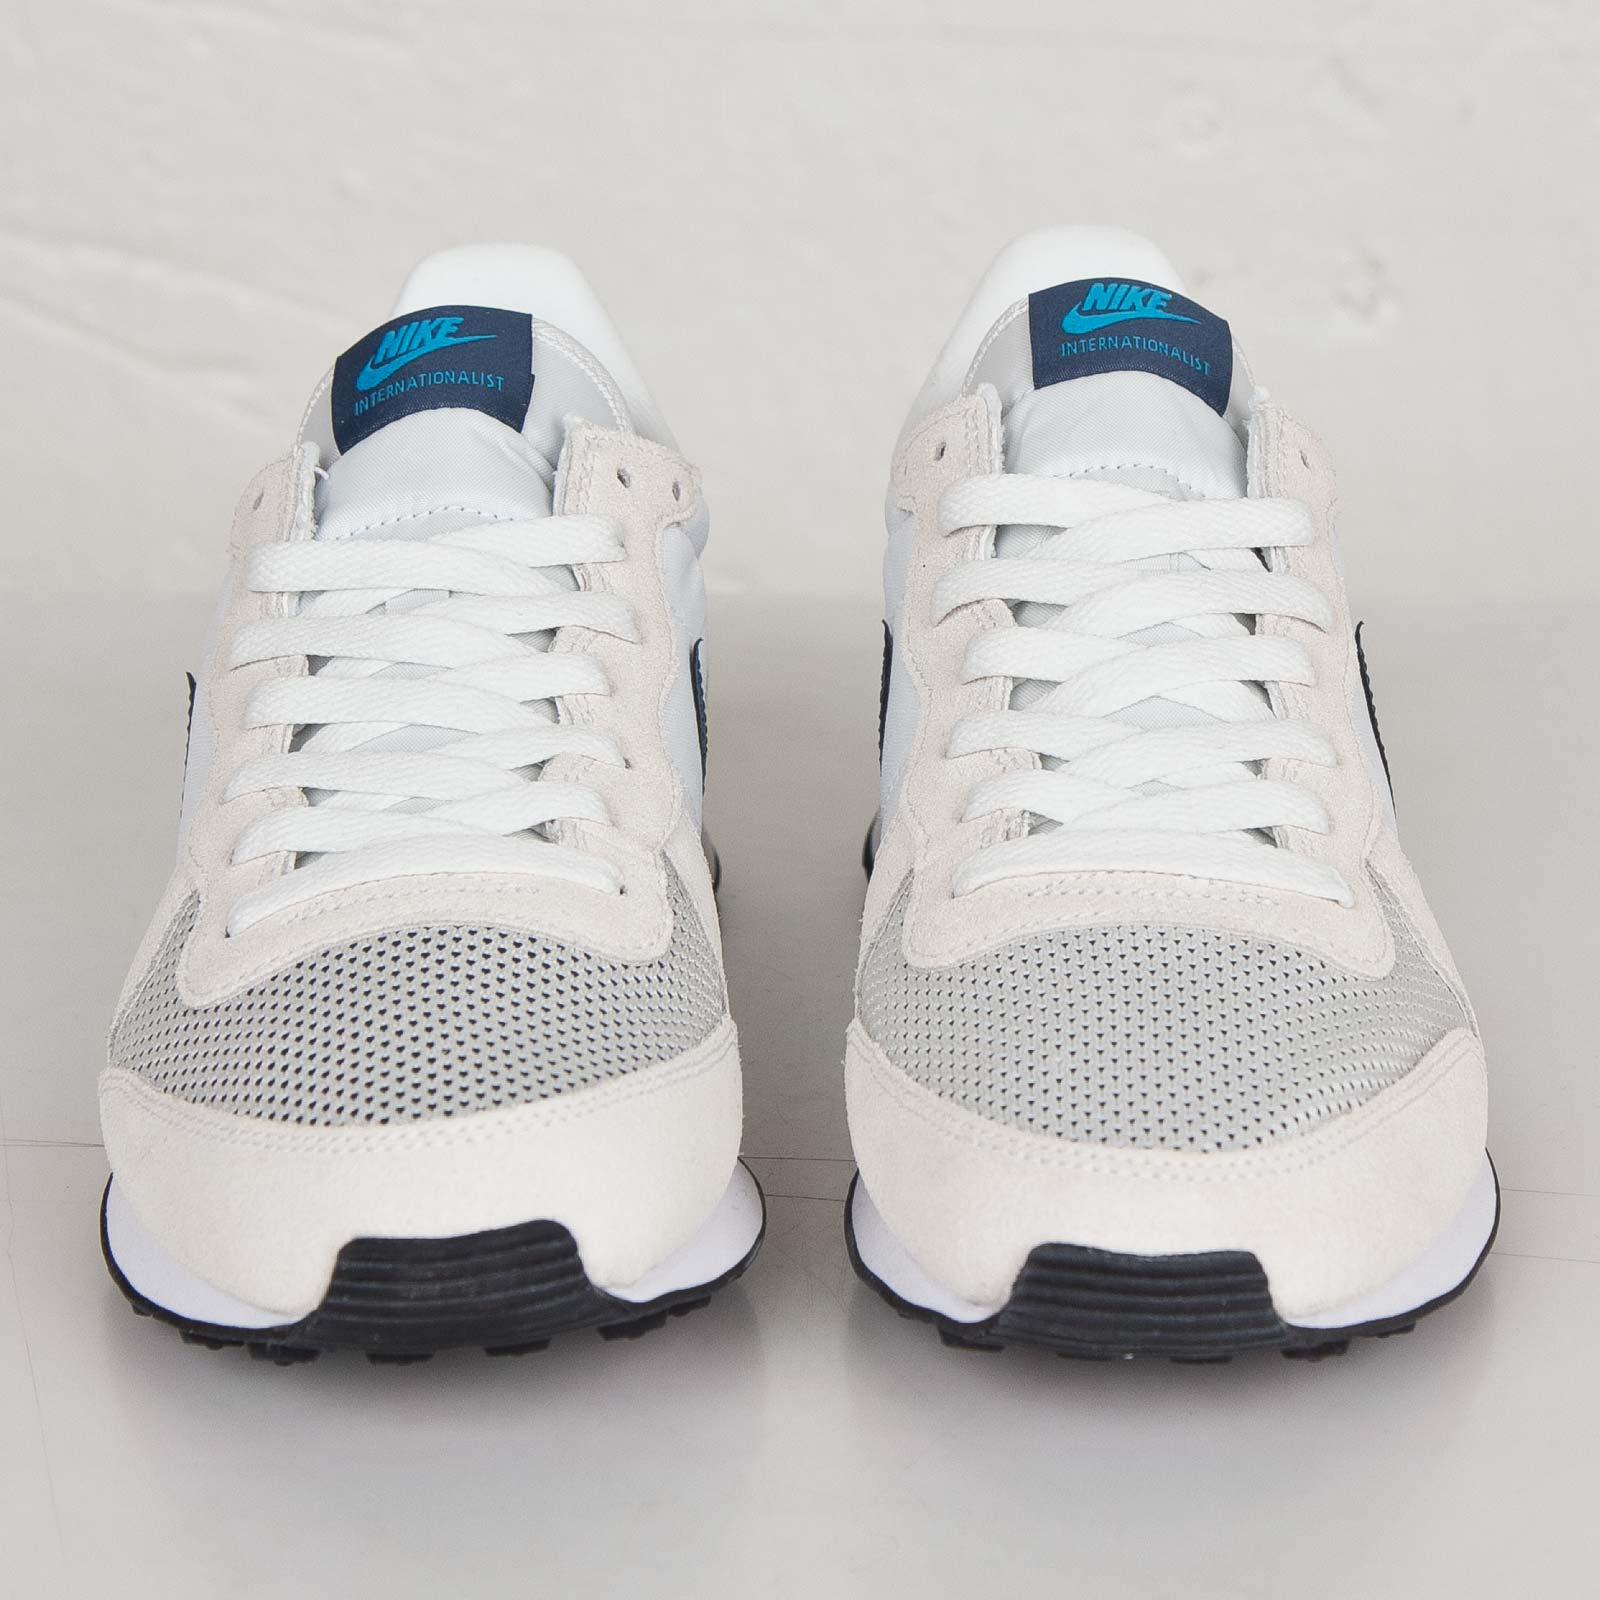 Nike Internationalist - 631754-100 - Sneakersnstuff  98704d98c